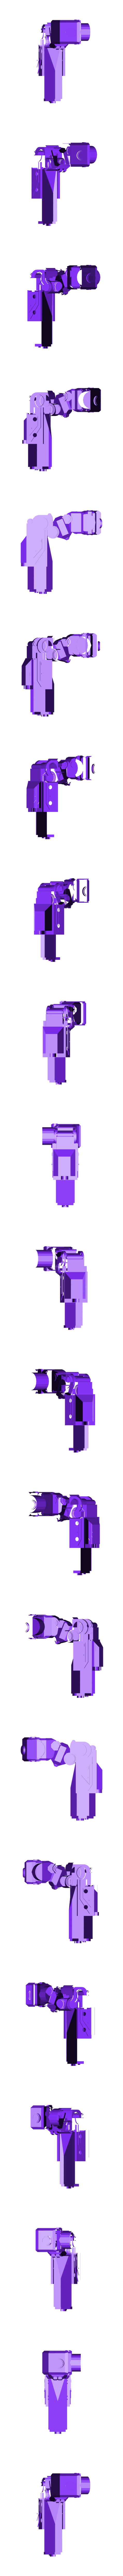 Left_Laser_Rifle_Arm.stl Download free STL file Modular Linebacker Mech • 3D printing object, mrhers2